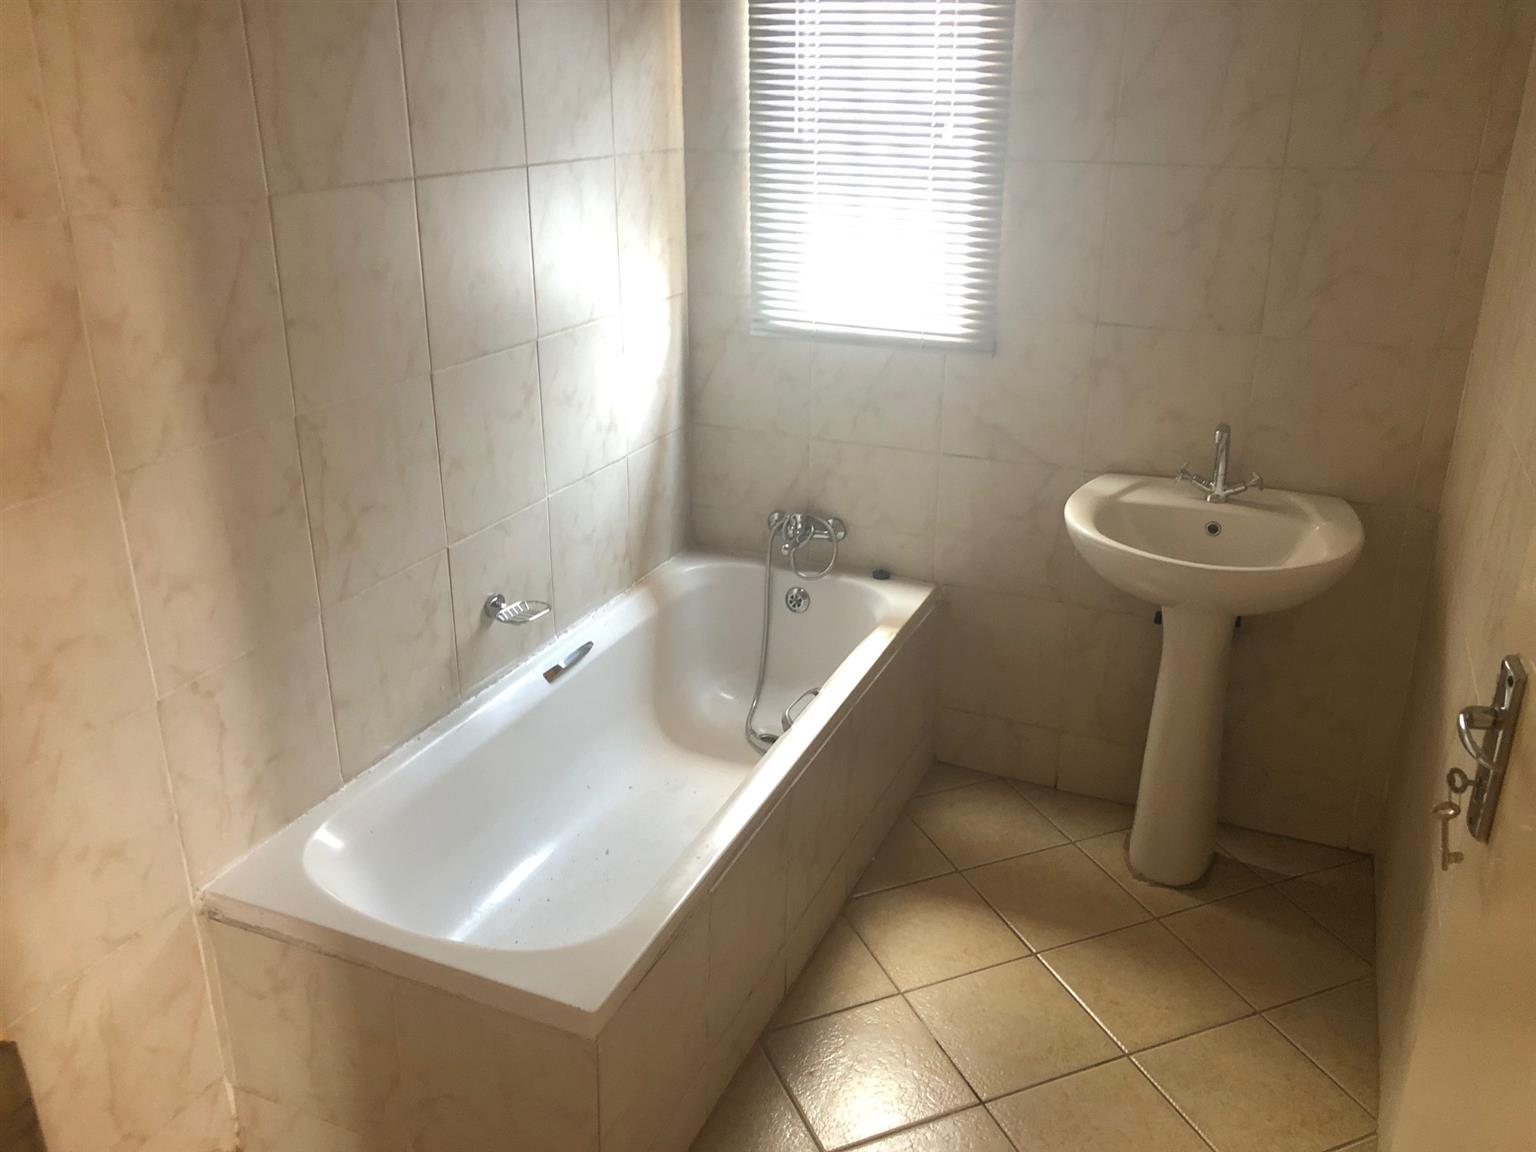 81 JORDAAN STR - 3 BEDROOM HOUSE IN AKASIA (RAPID RENTALS)